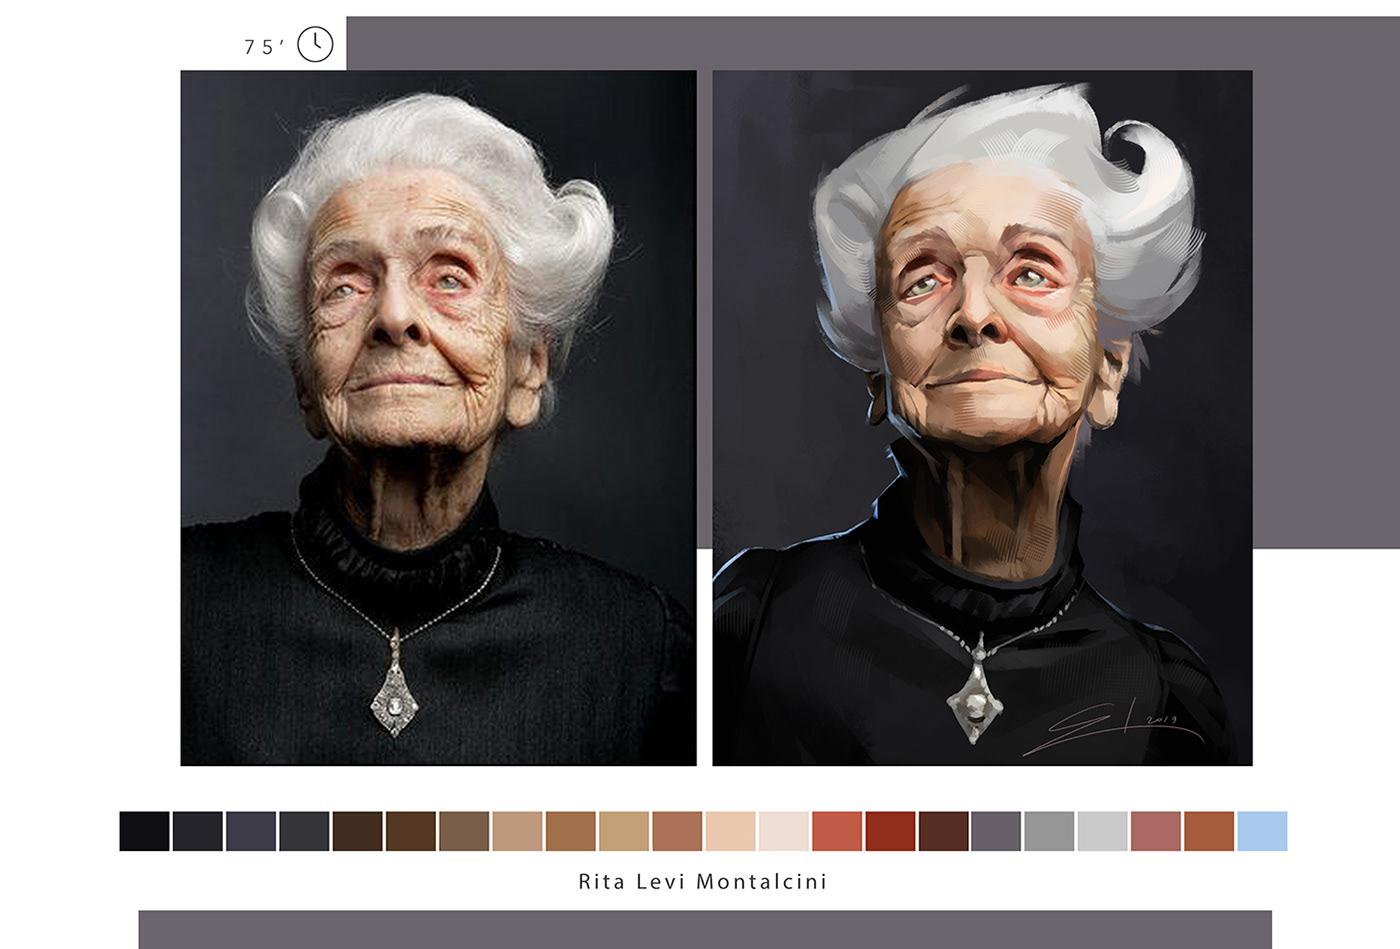 Image may contain: human face, cartoon and screenshot